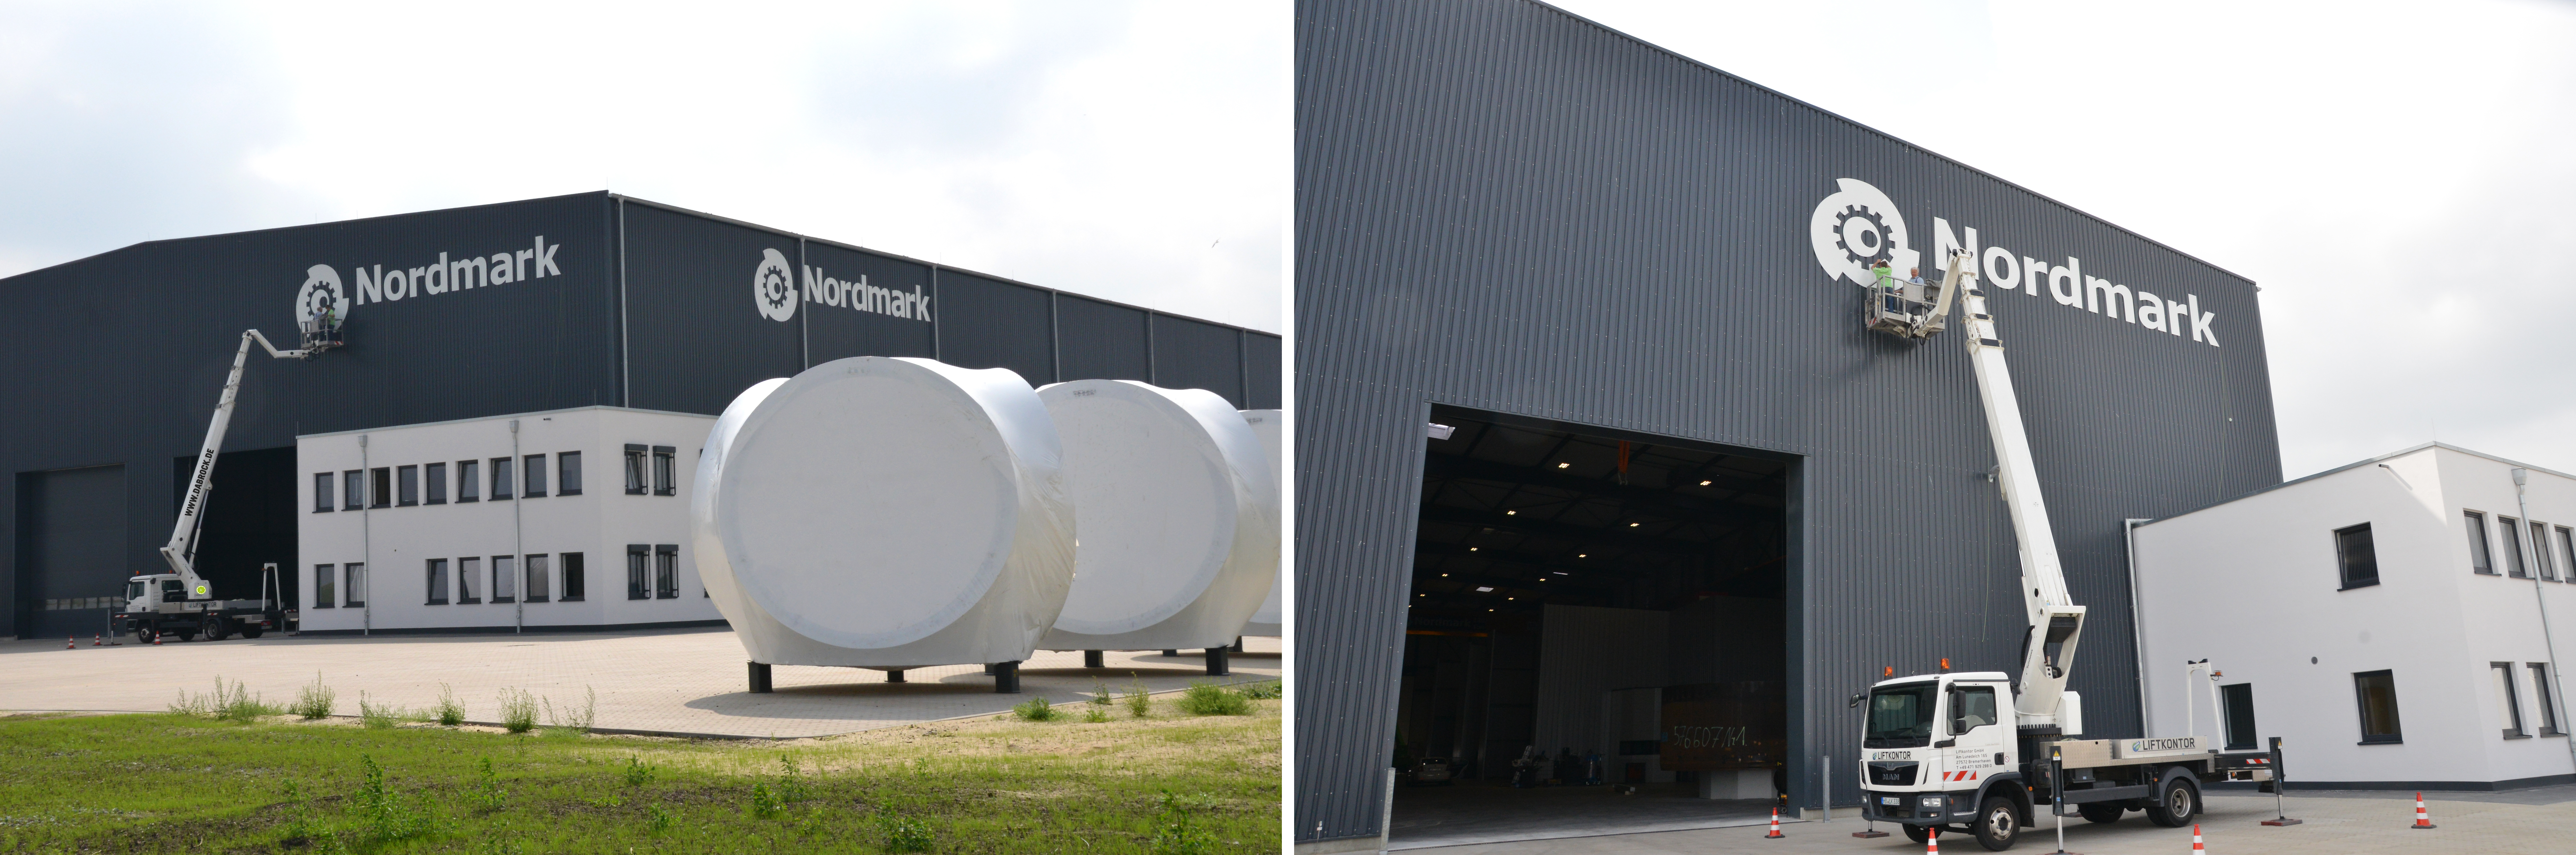 Nordmark GmbH // Cuxhaven